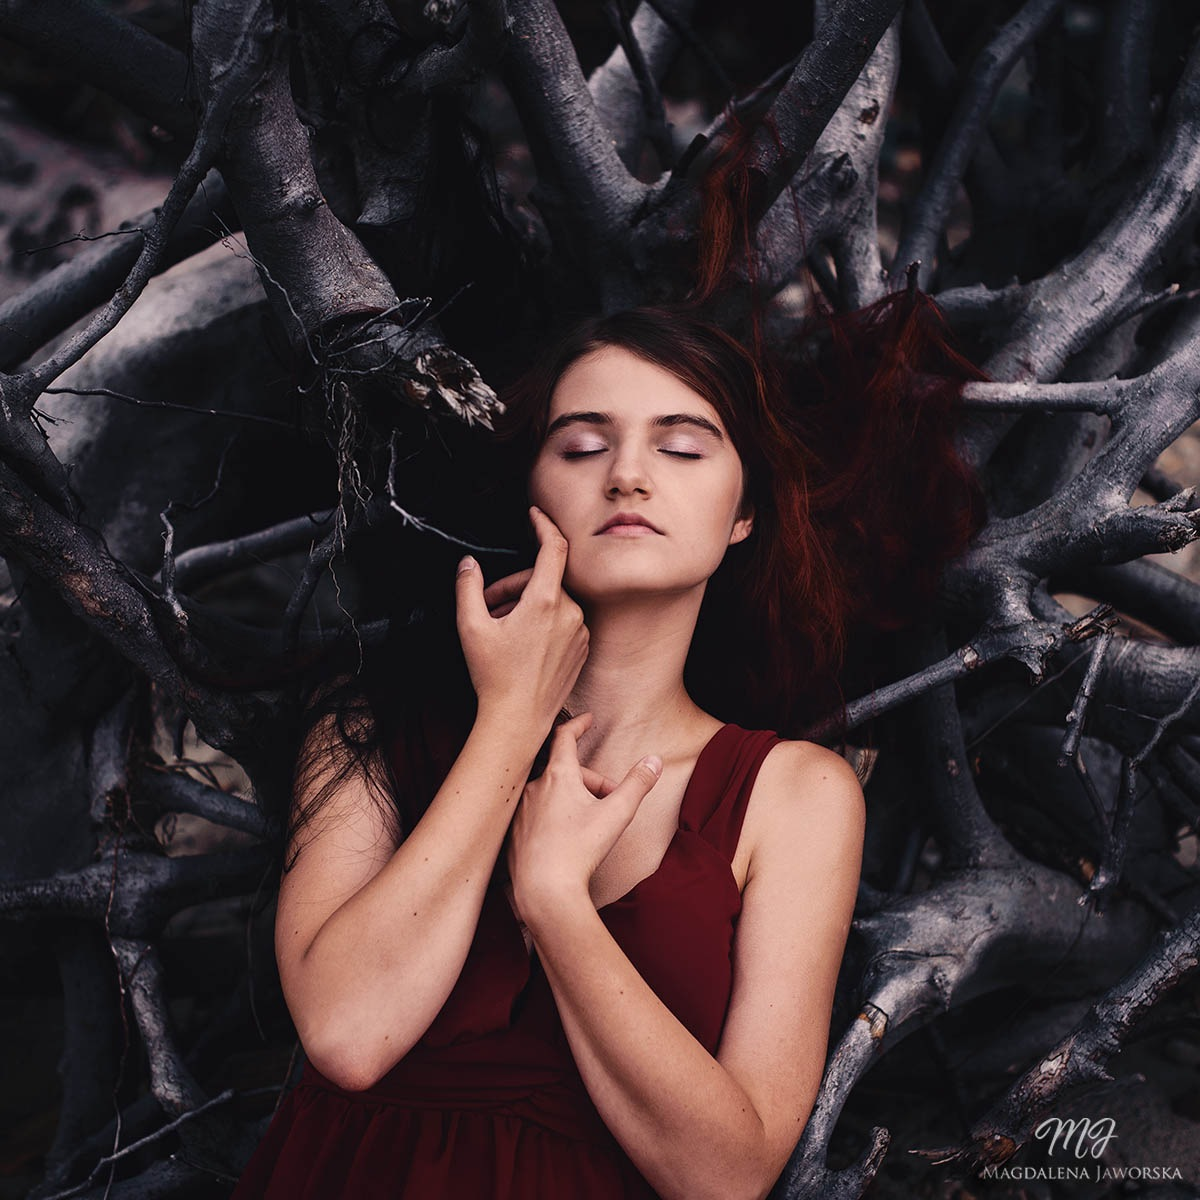 Untitled by Magdalena Jaworska